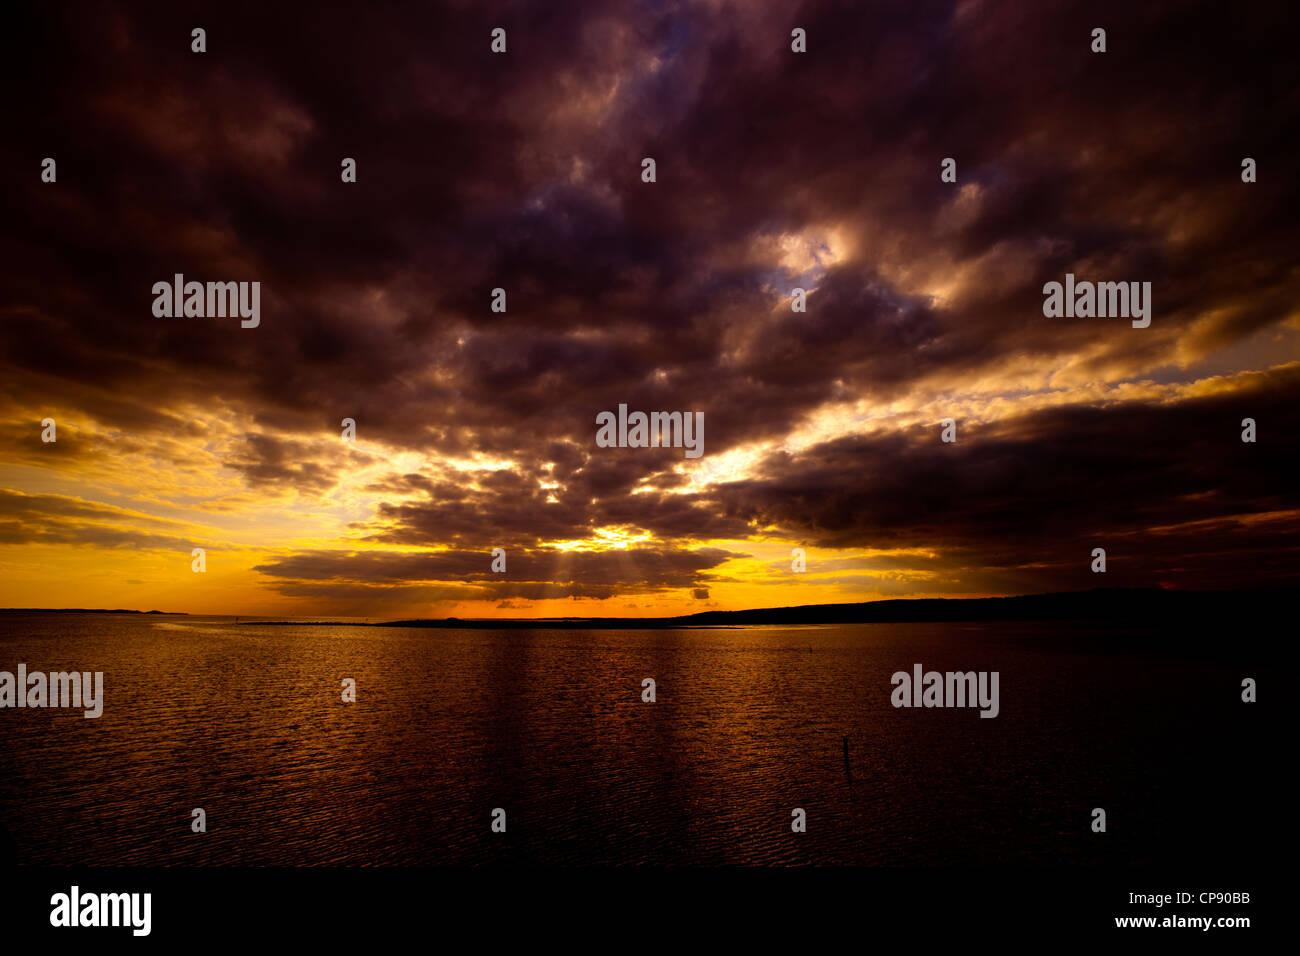 The sun setting across the Loughor Estuary, Swansea. Stock Photo